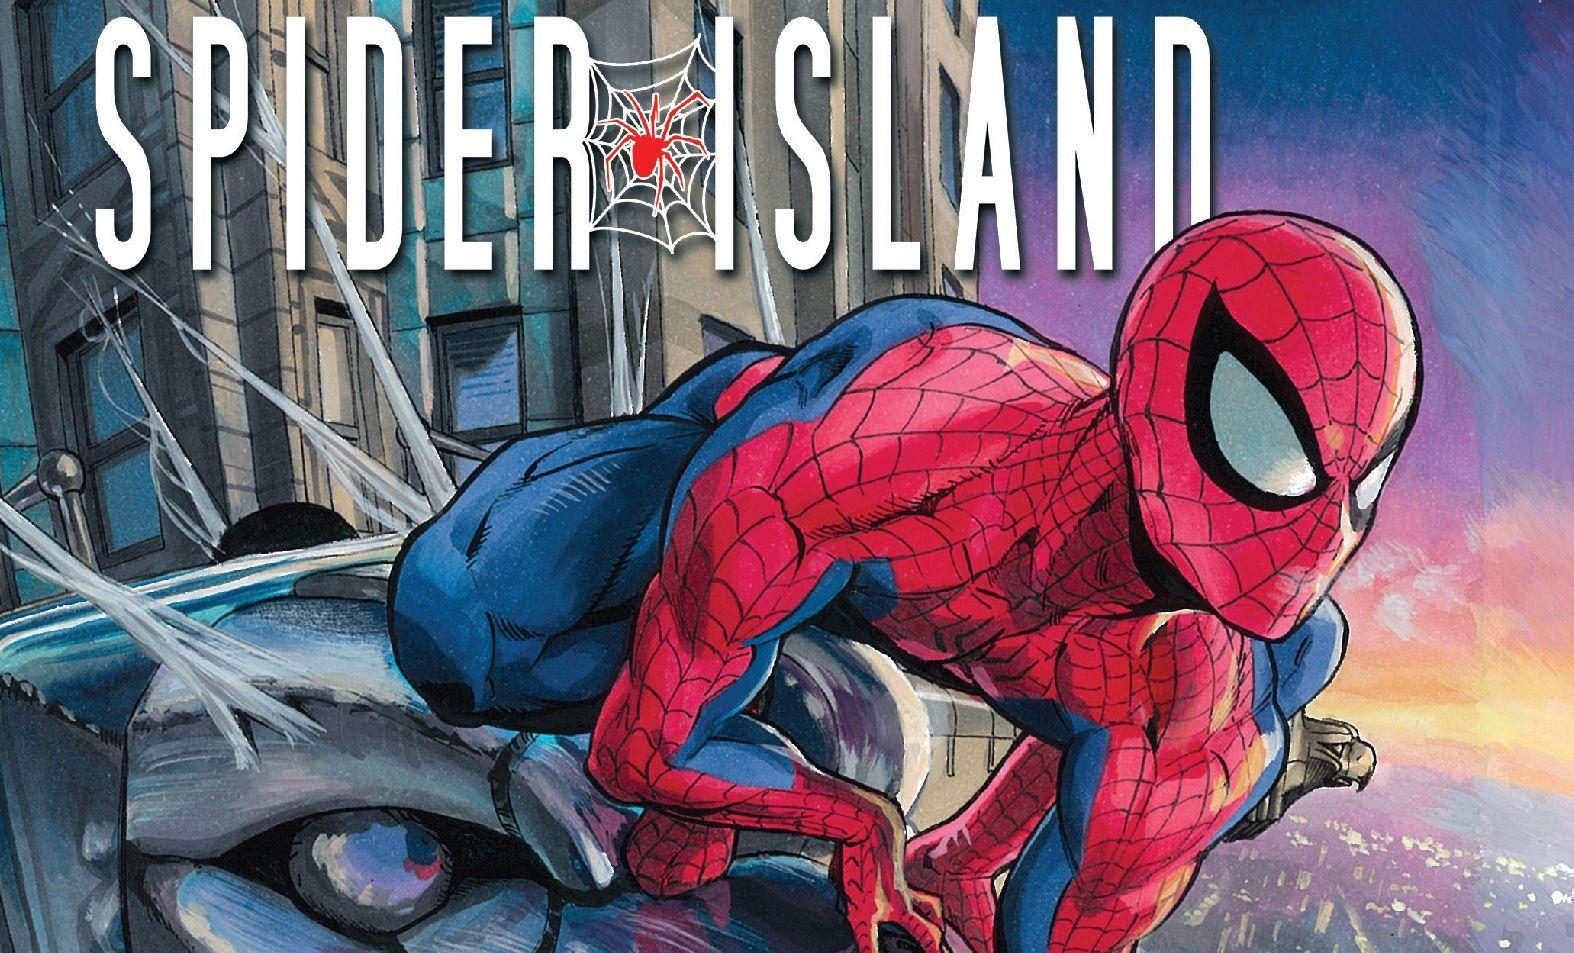 Dan Slott Spider-Island Humberto Ramos